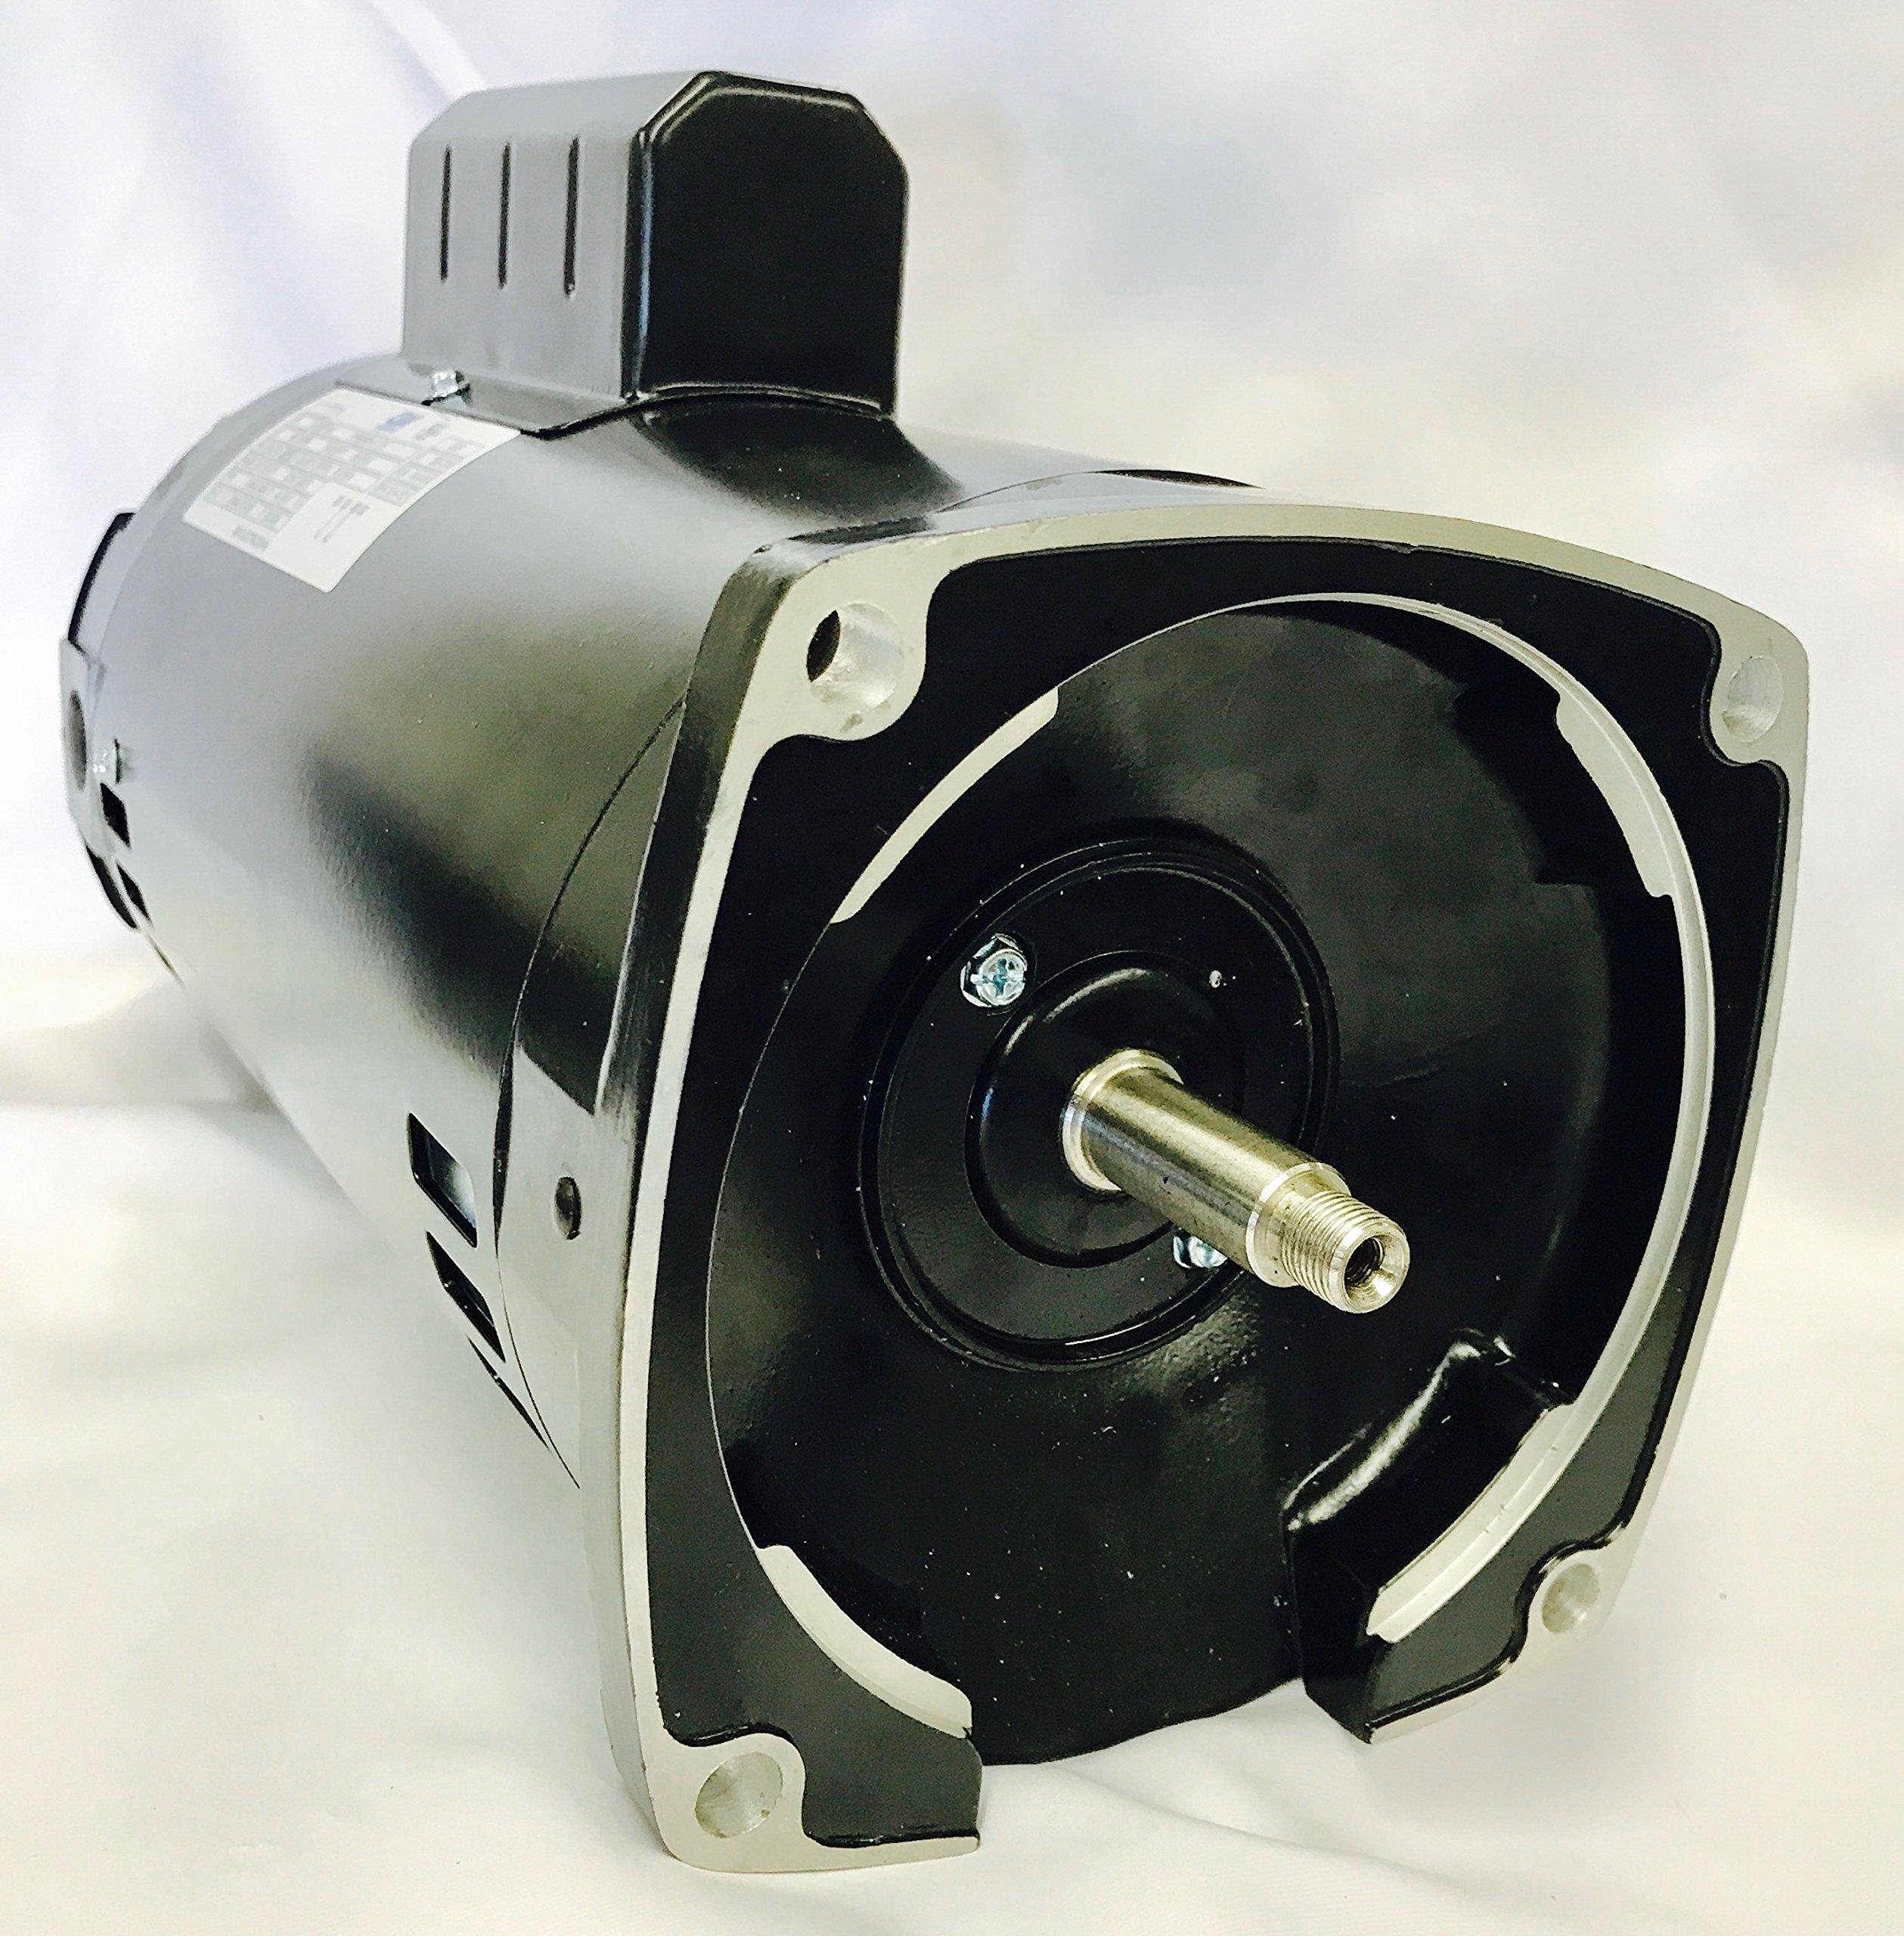 GW YYN5682-L7 2 HP, 3450RPM, 1.3 Service Factor, 56Y Frame, ODP Enclosure, 208-230V, Square Flange Pool Motor by GW